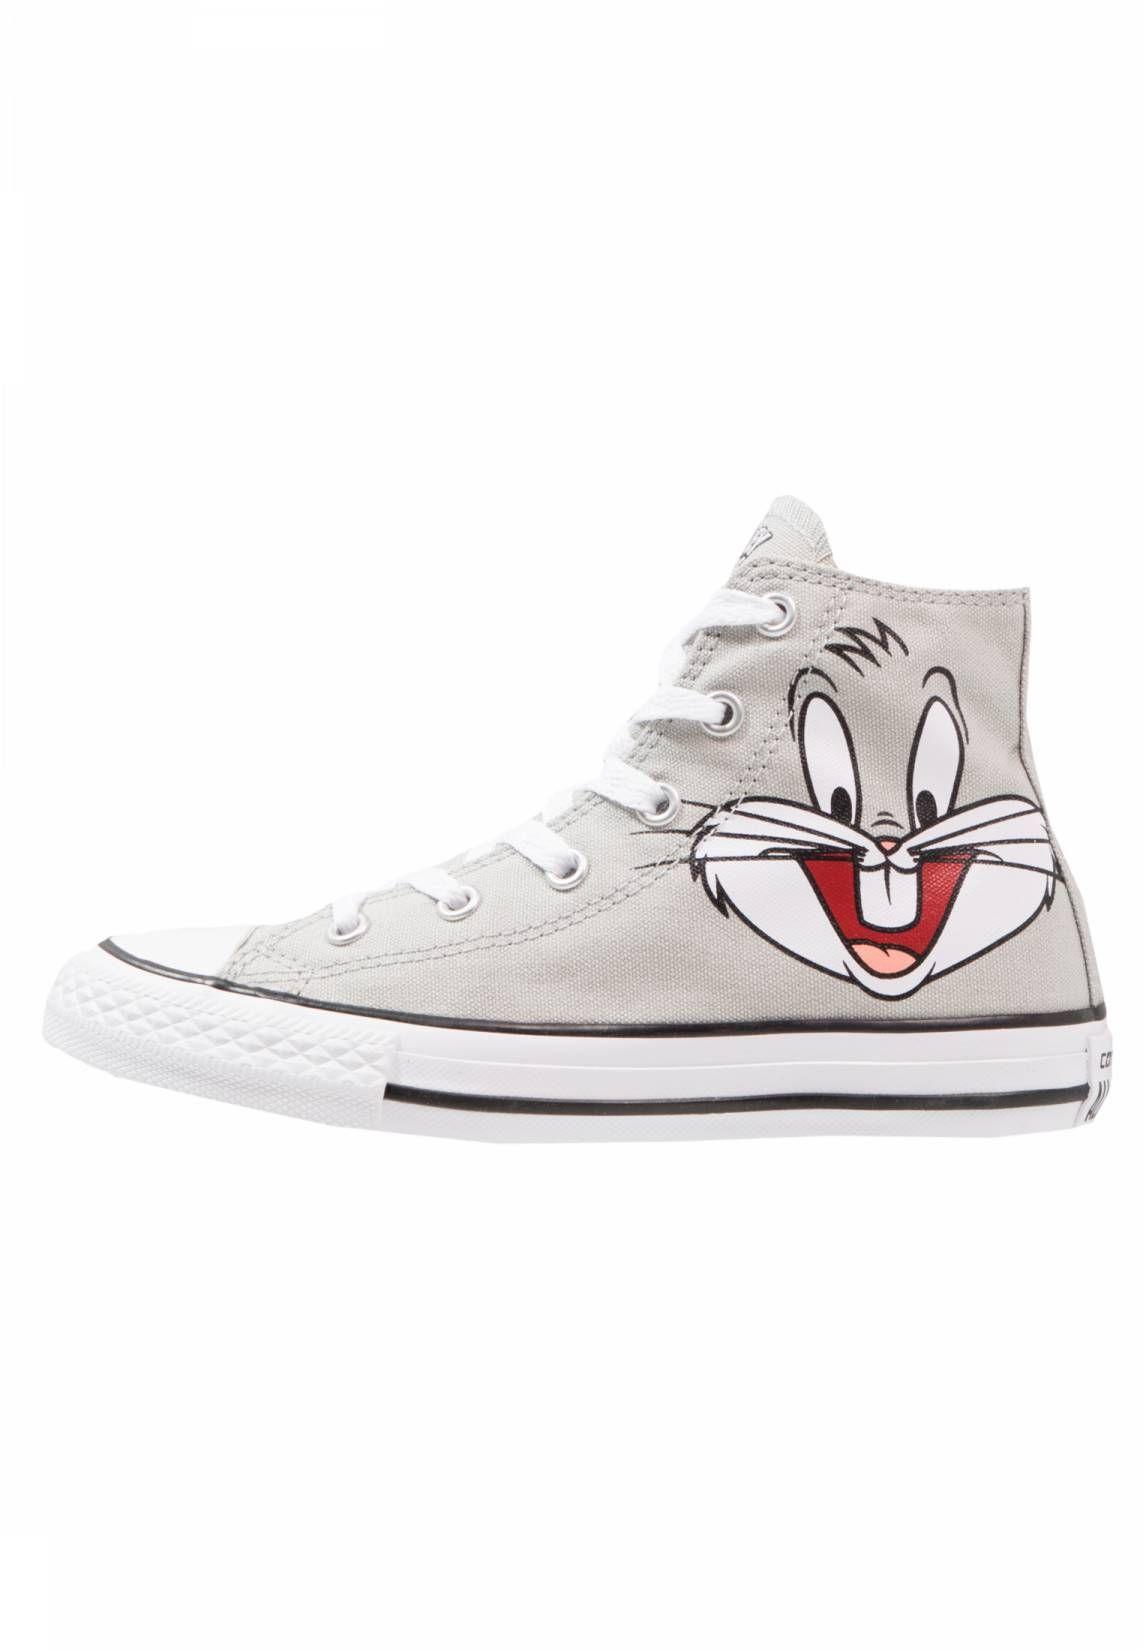 Converse. CHUCK TAYLOR BUGS BUNNY Zapatillas altas